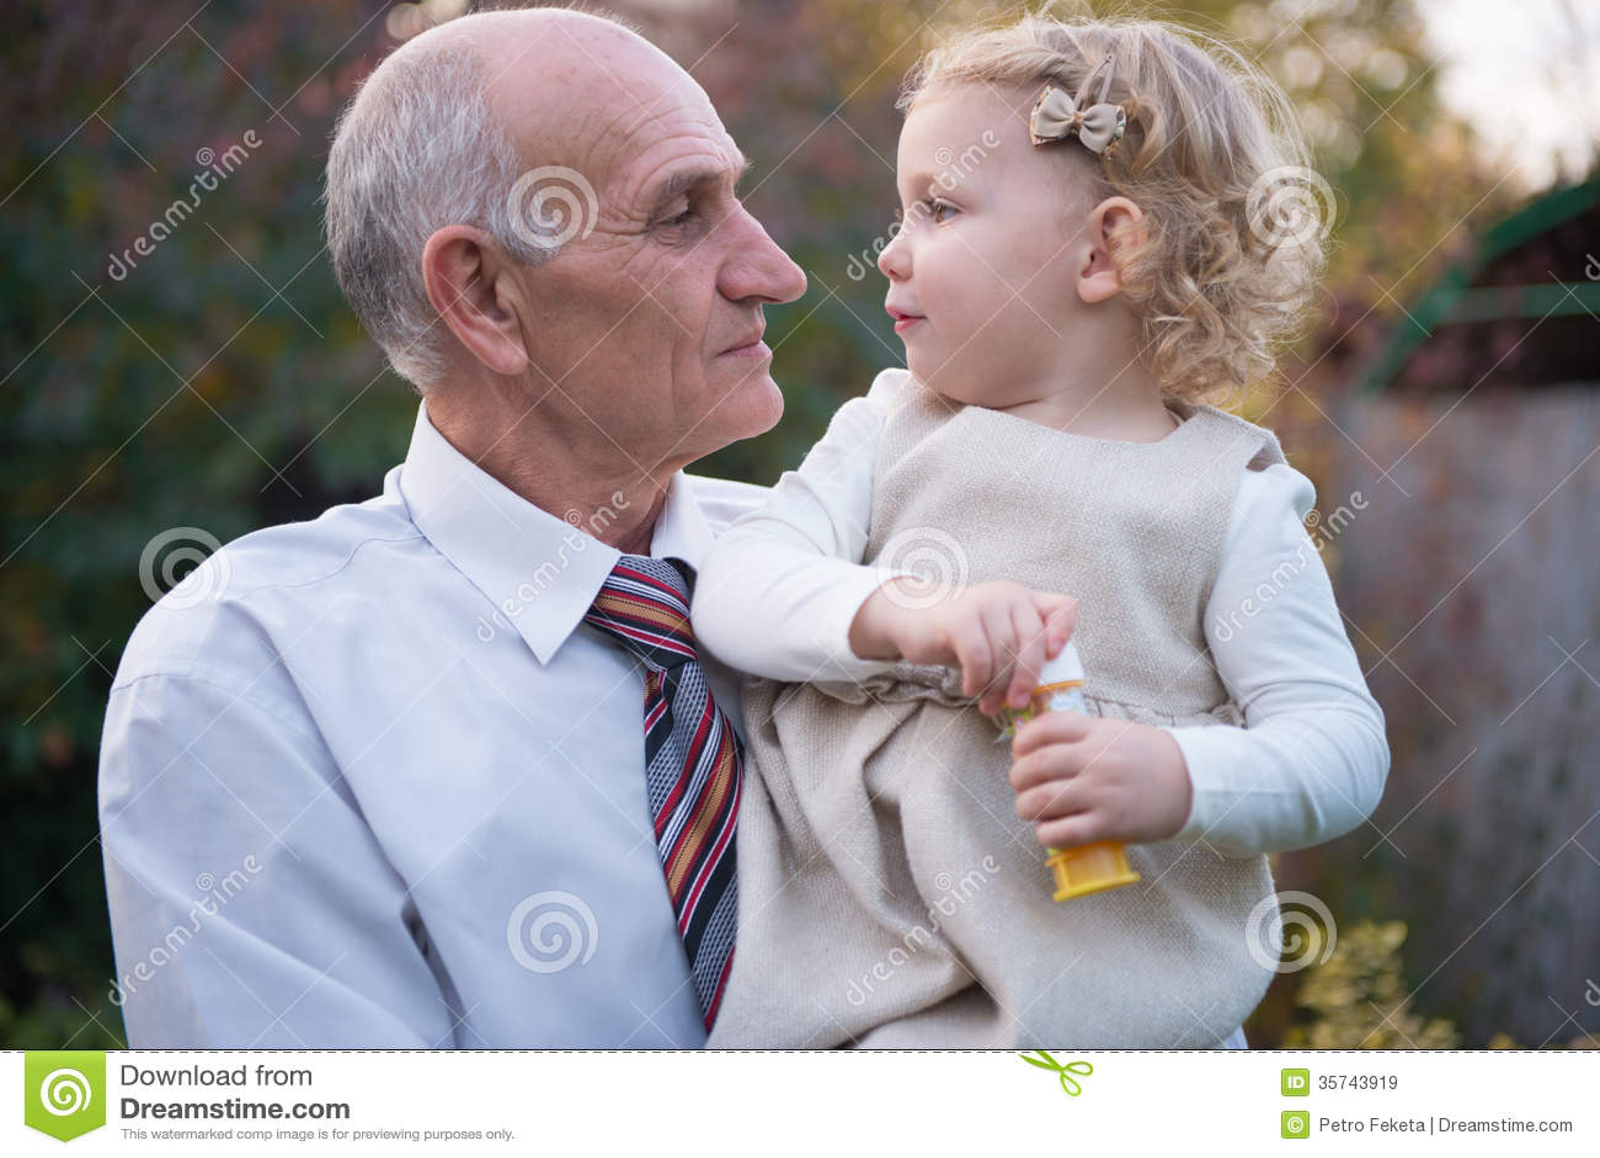 starik-trahaet-molodenkuyu